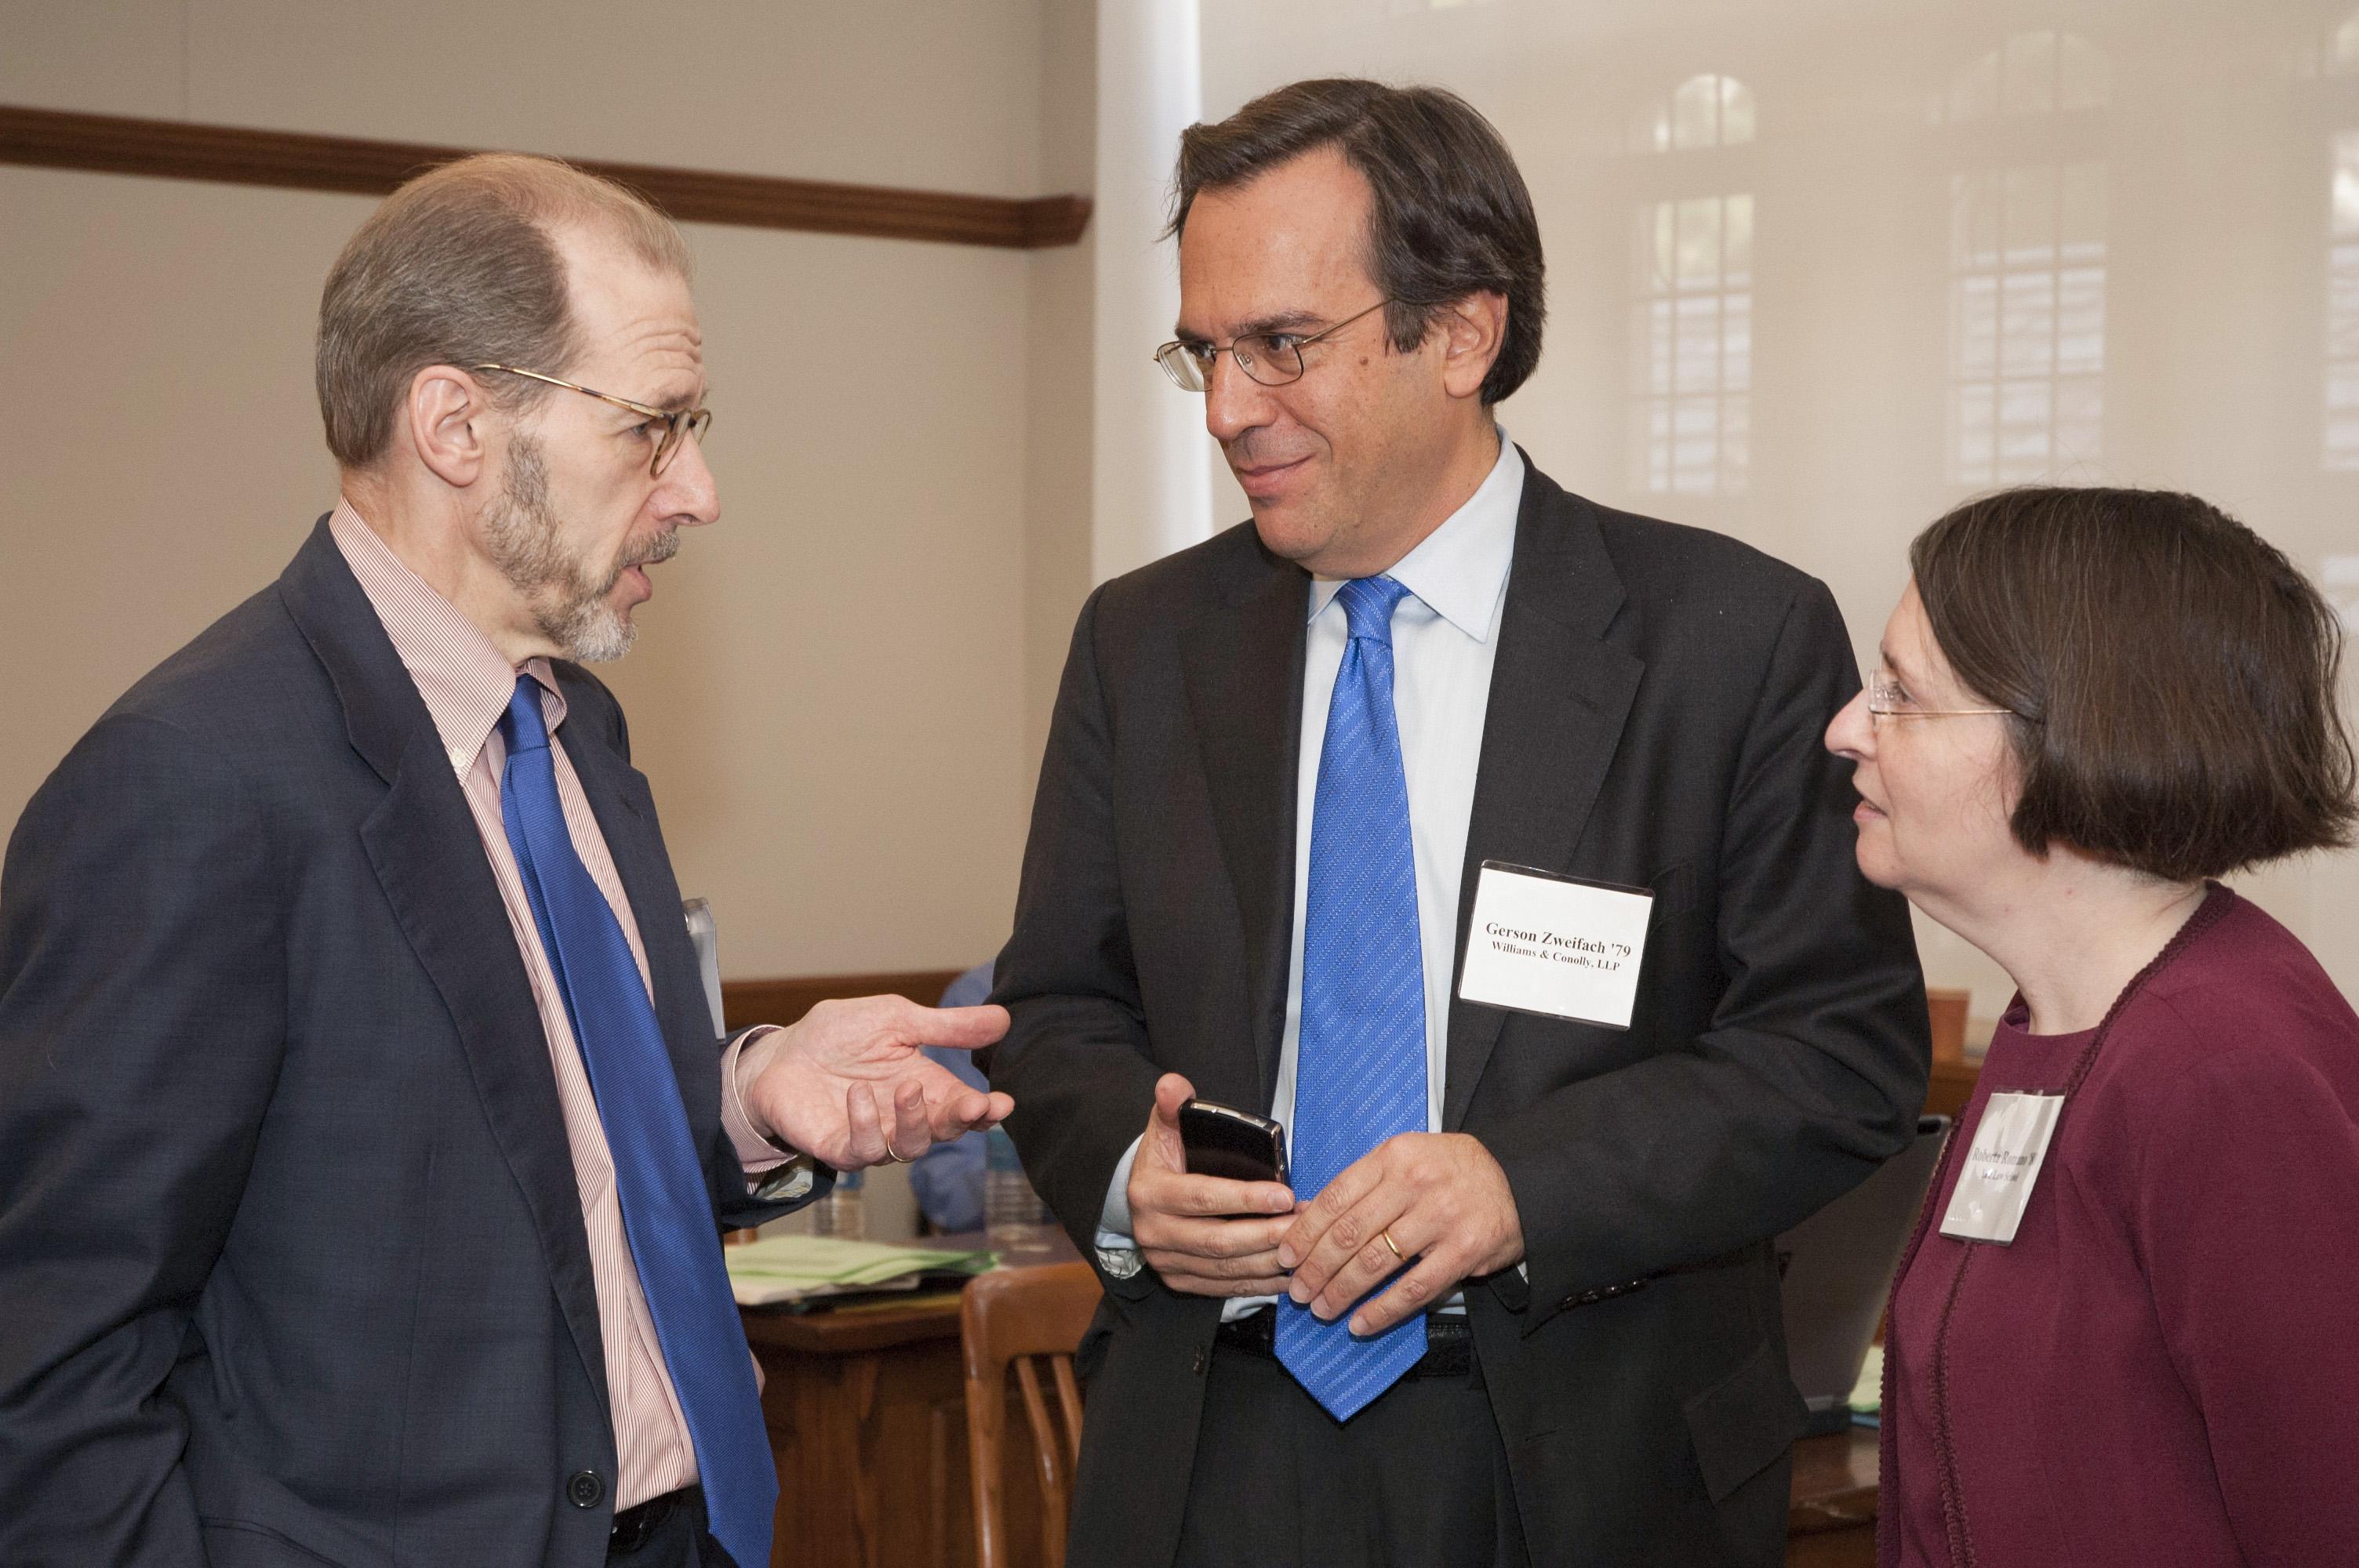 YLS Prof. Henry Hansmann '74, Gerson Zweifach '79, and YLS Prof. and Center Dir. Roberta Romano '80